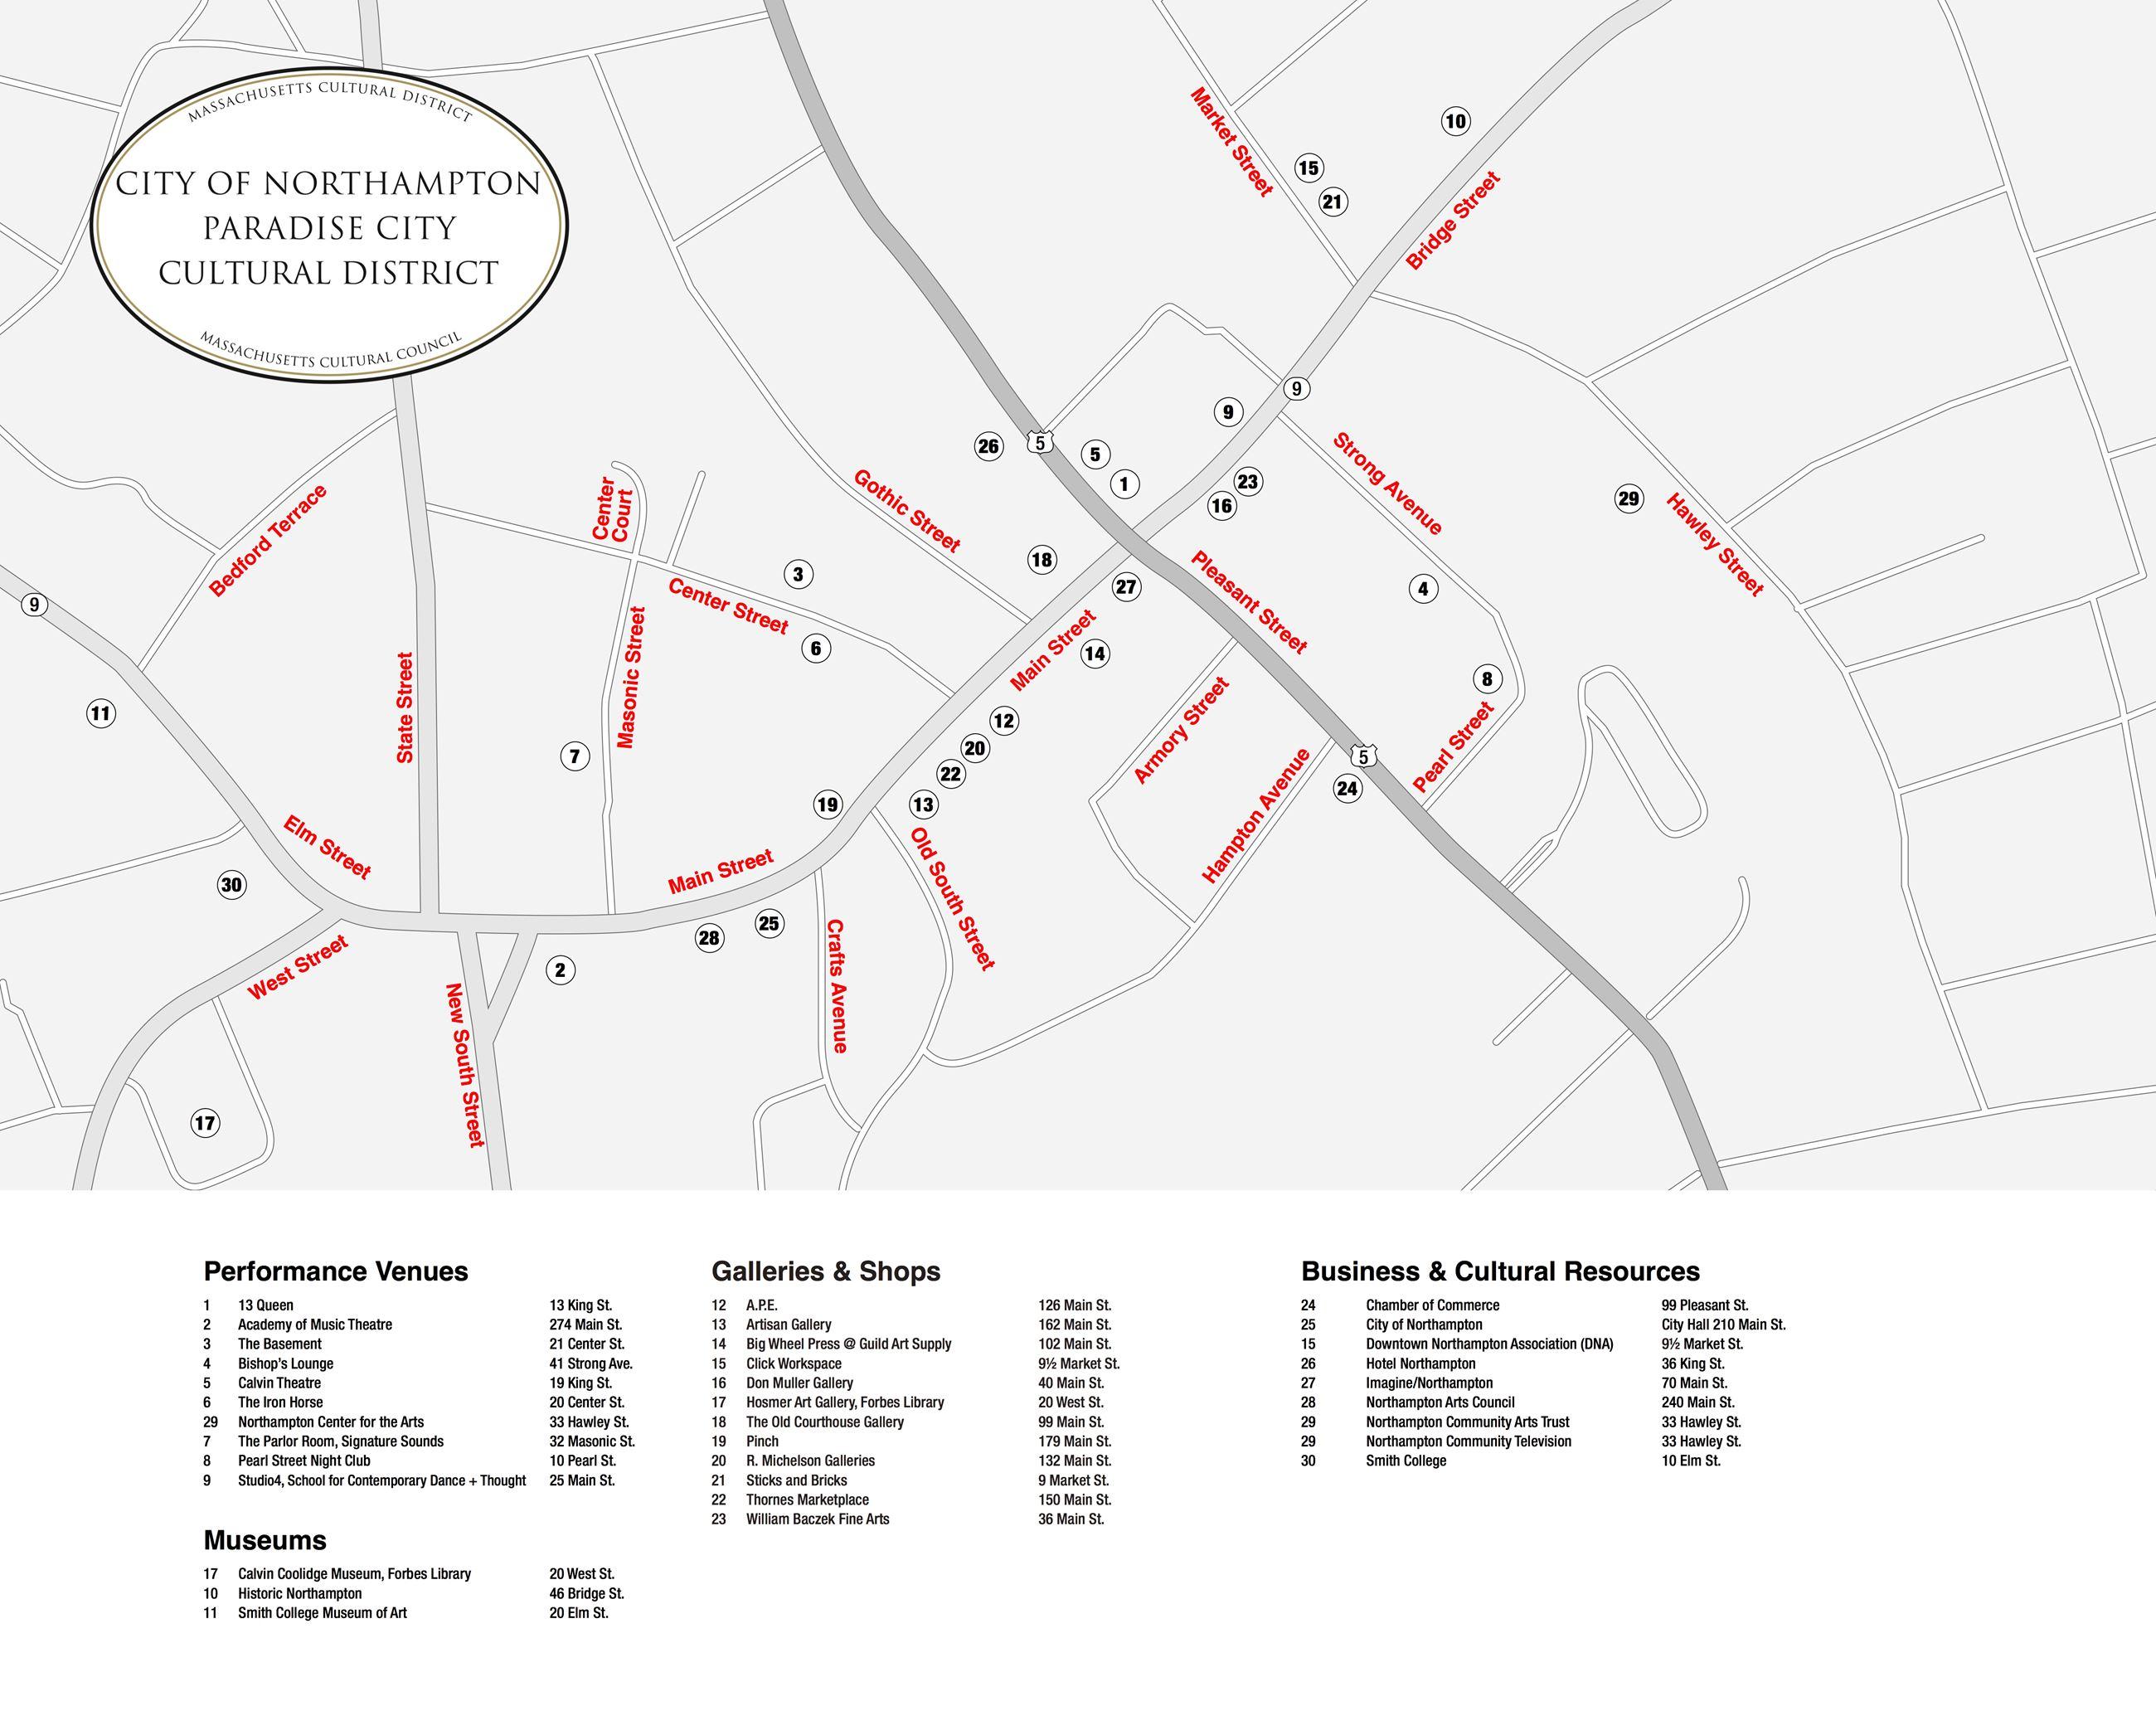 Arts & Culture Department   Northampton, MA - Official Website Ma City Map on western ma map, sherborn ma map, florida ma map, ma on us map, ma railway map, ma world map, pittsfield ma street map, ma map with cities and towns, ma utility map, town of plymouth ma map, ma island map, new marlborough ma map, ma elevation map, ma transit map, ma county map, towns in ma map, ma region map, town of harvard ma map, lowell ma map, ma state map,